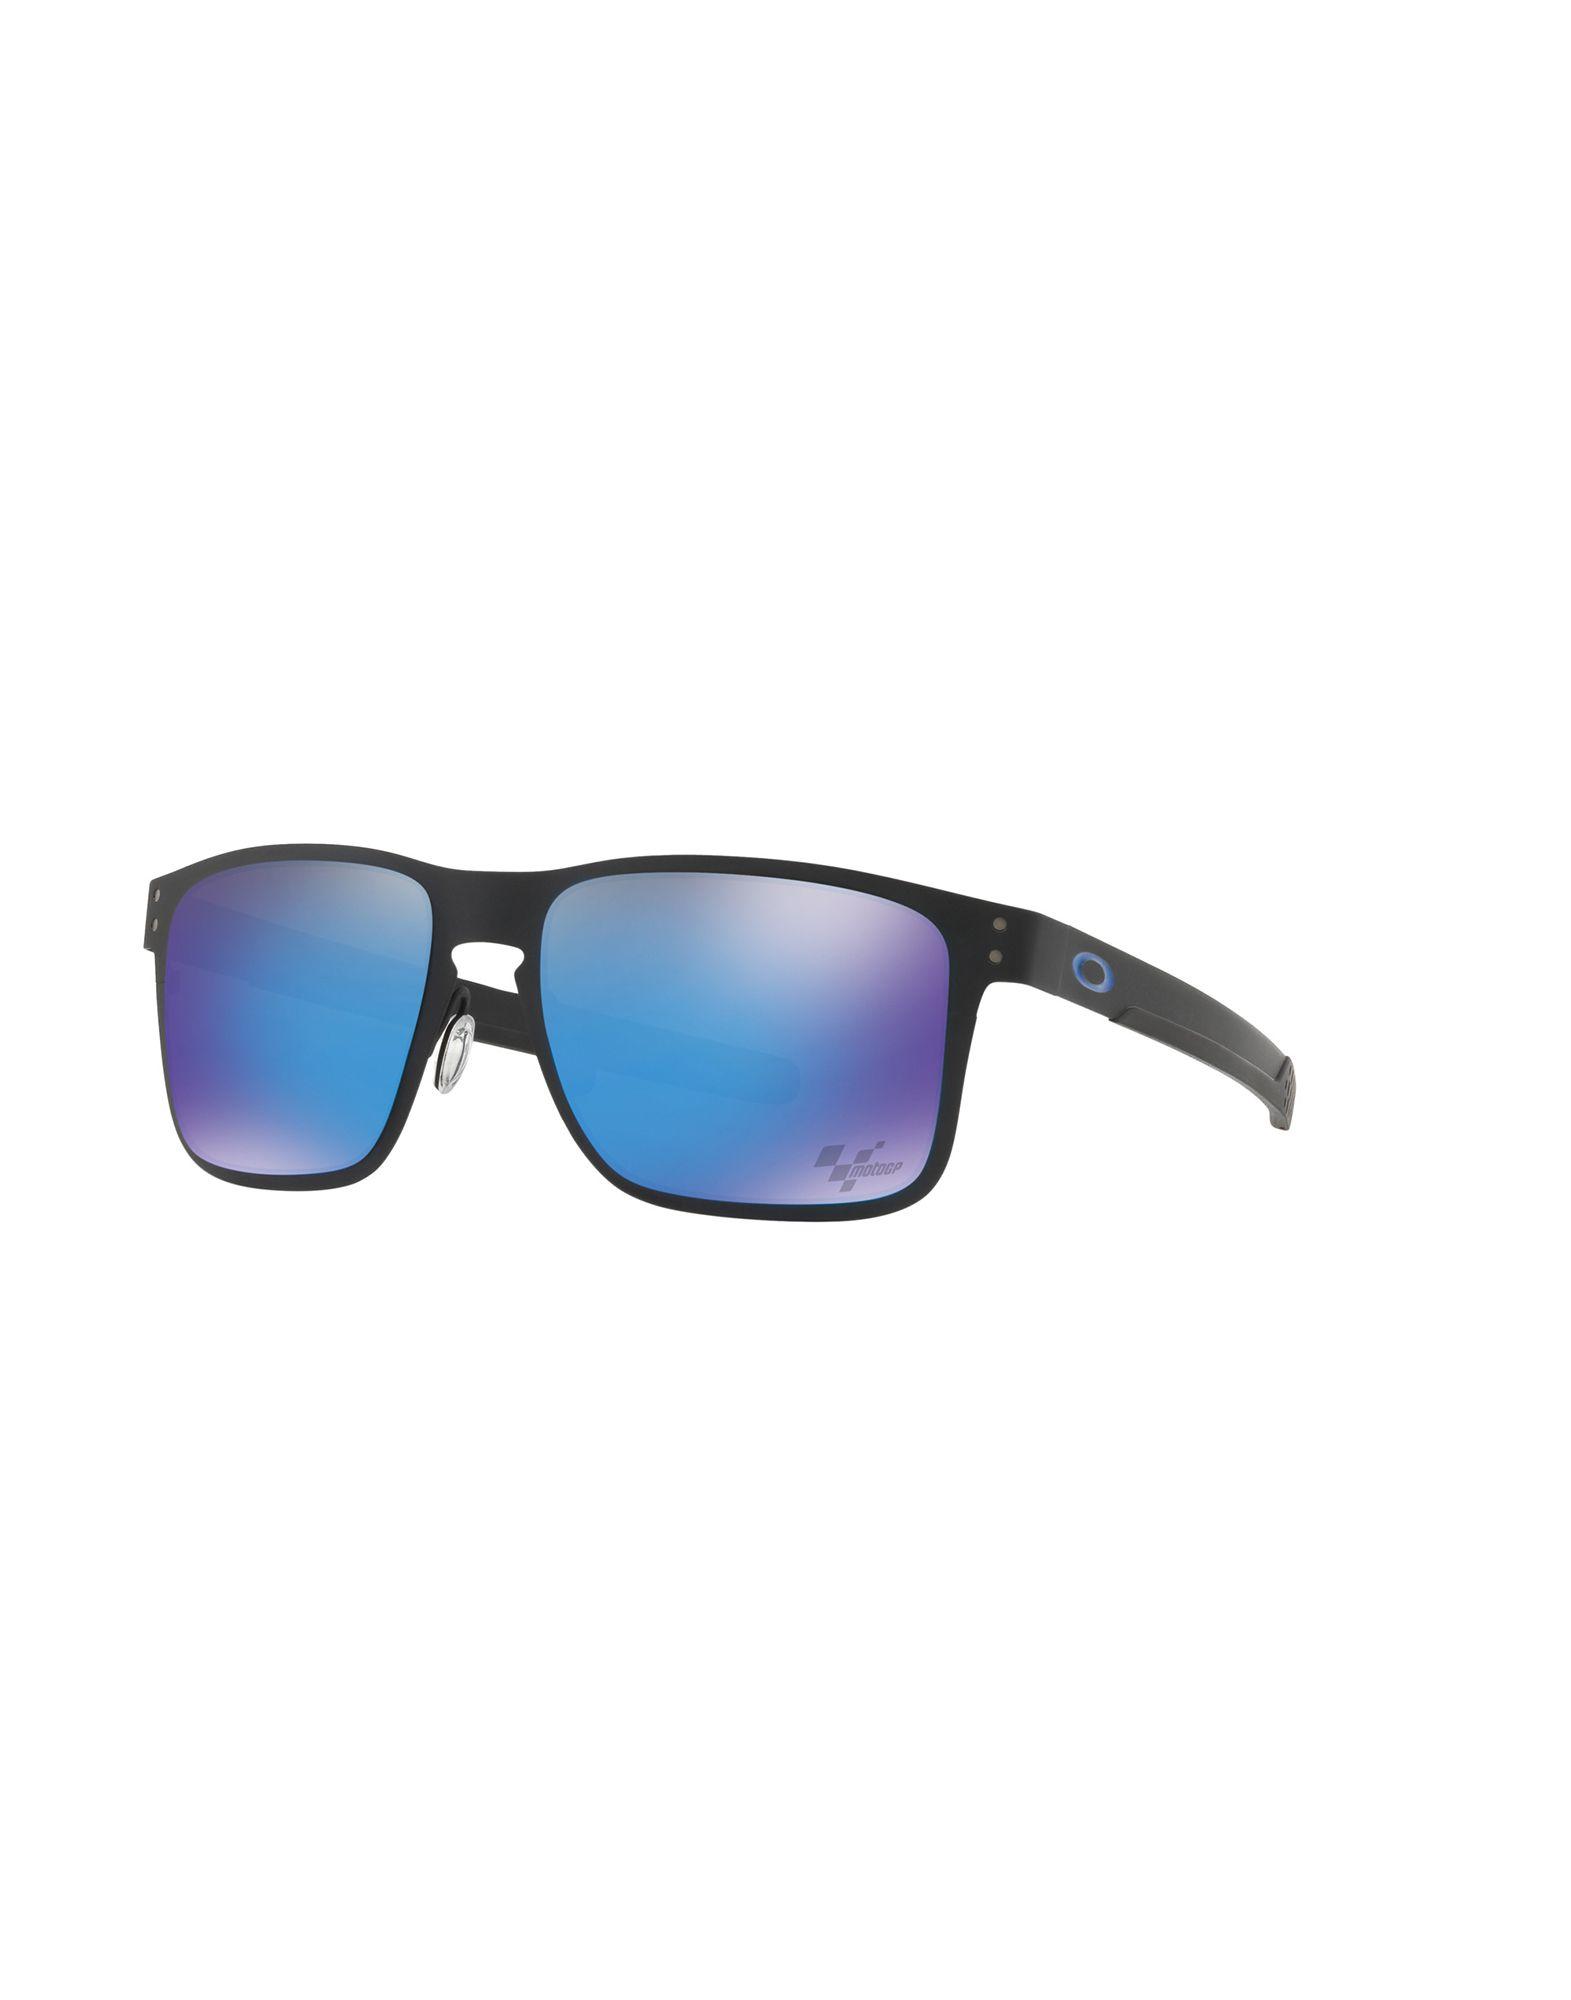 OAKLEY Солнечные очки солнцезащитные очки oakley frogskins aquatique 24 358 24 359 24 361 24 362